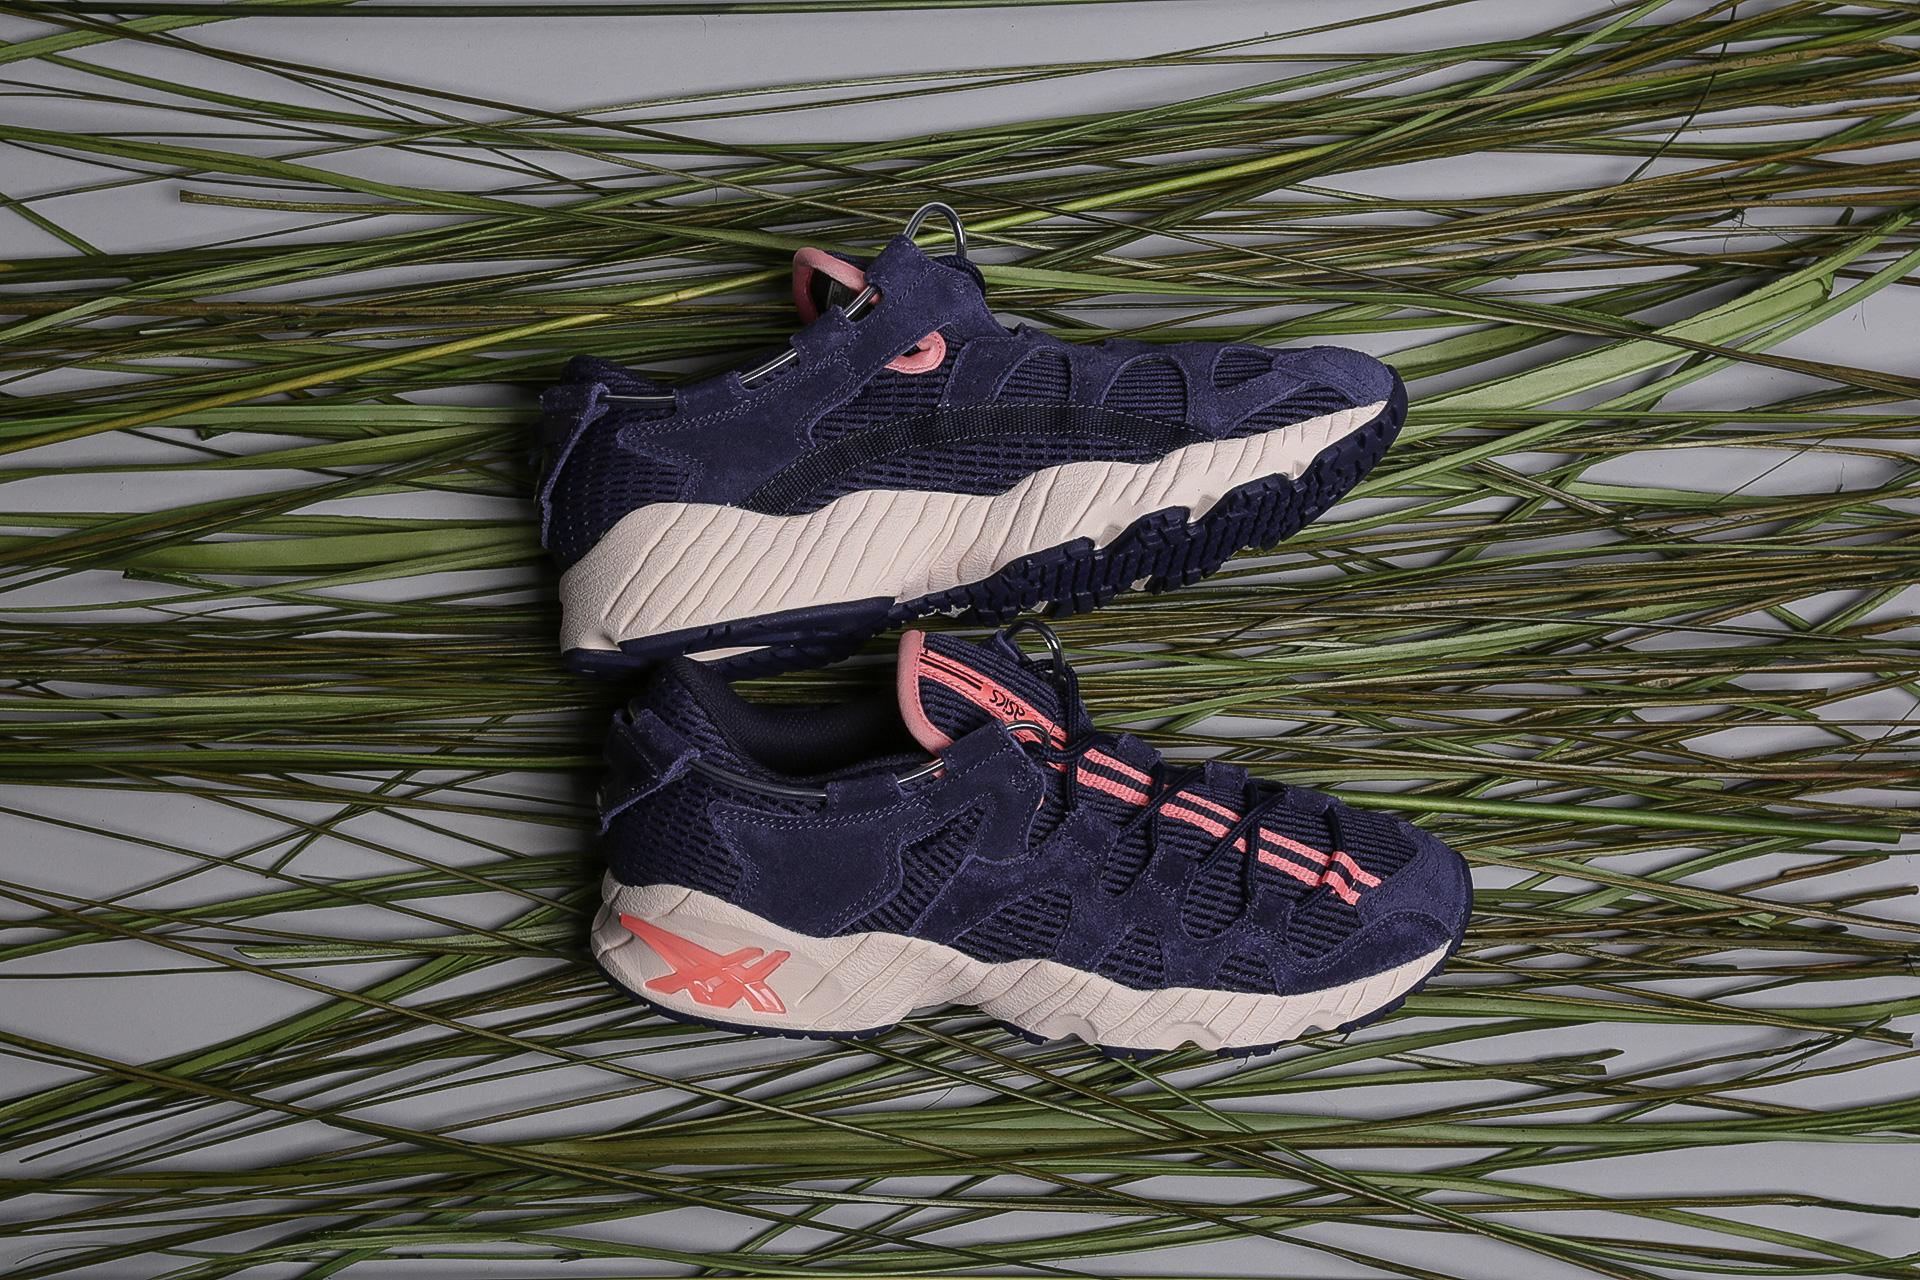 buy popular 7506b 089a2 Купить синие мужские кроссовки Gel-Mai от ASICS (H8E3N-5858 ...